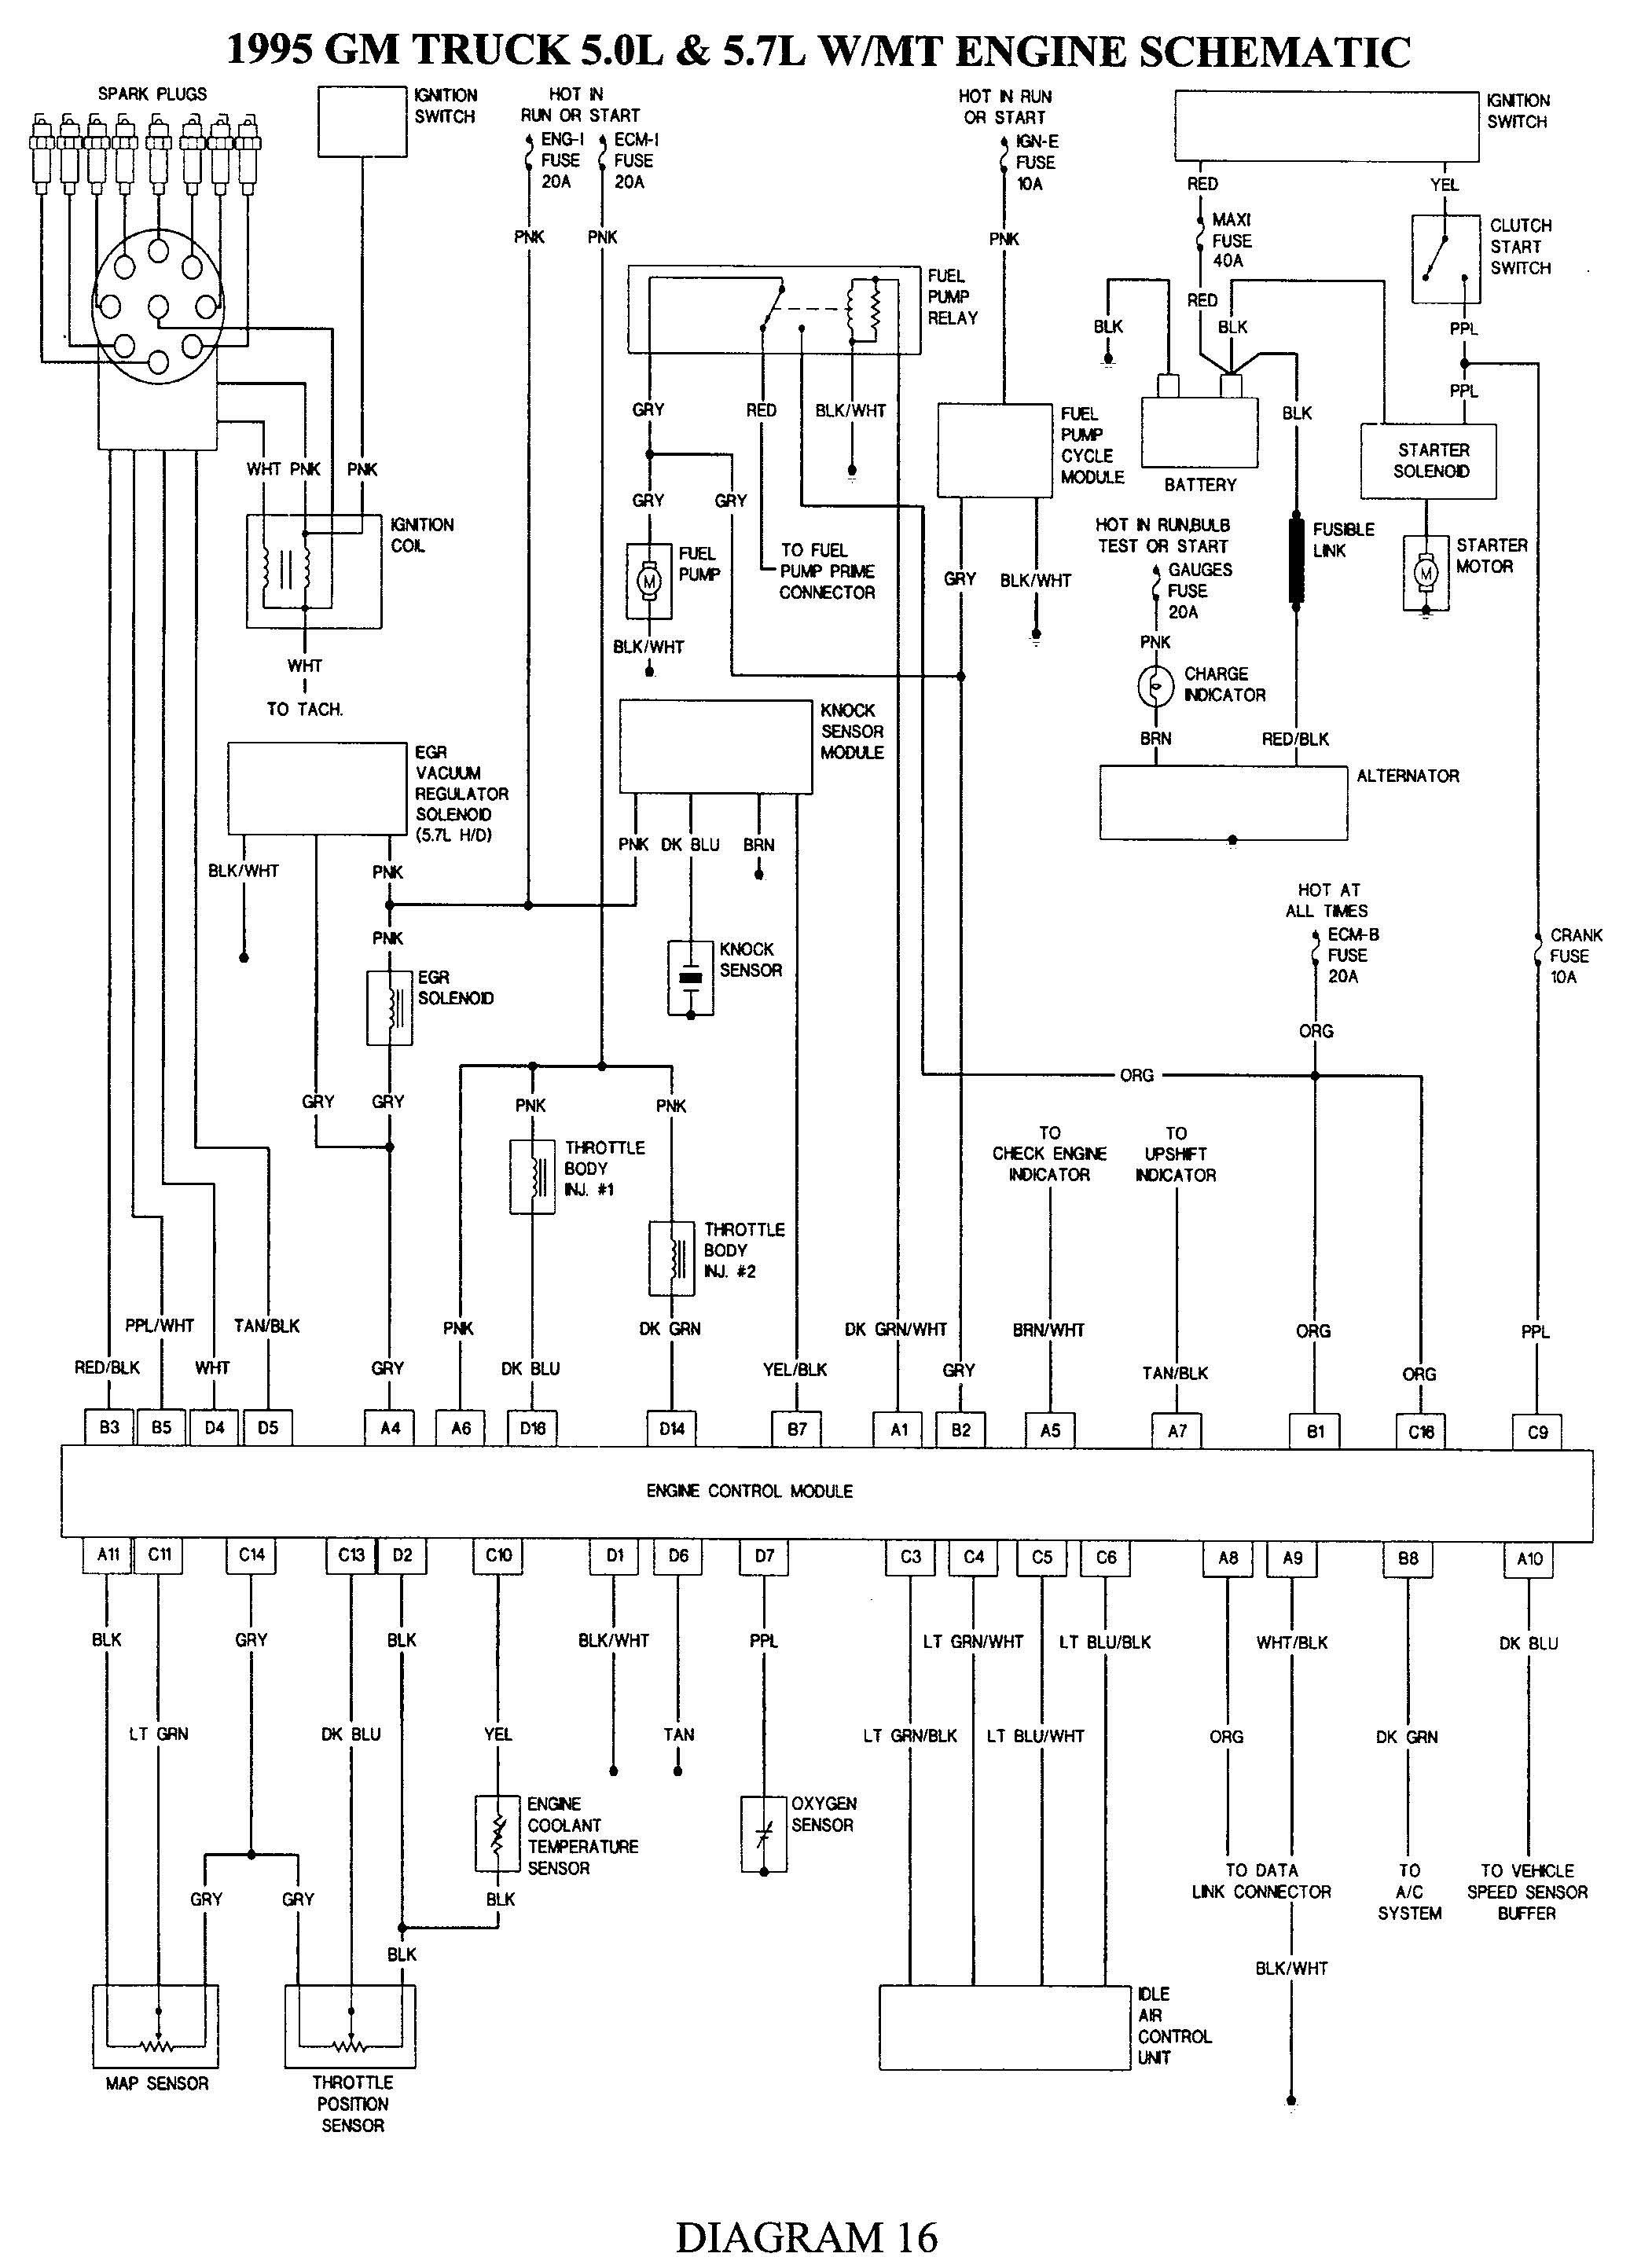 98 Chevy Z71 K1500 Sensor Wiring Diagram - Wiring Diagram Networks | 98 Chevy 1500 Wiring Diagram |  | Wiring Diagram Networks - blogger